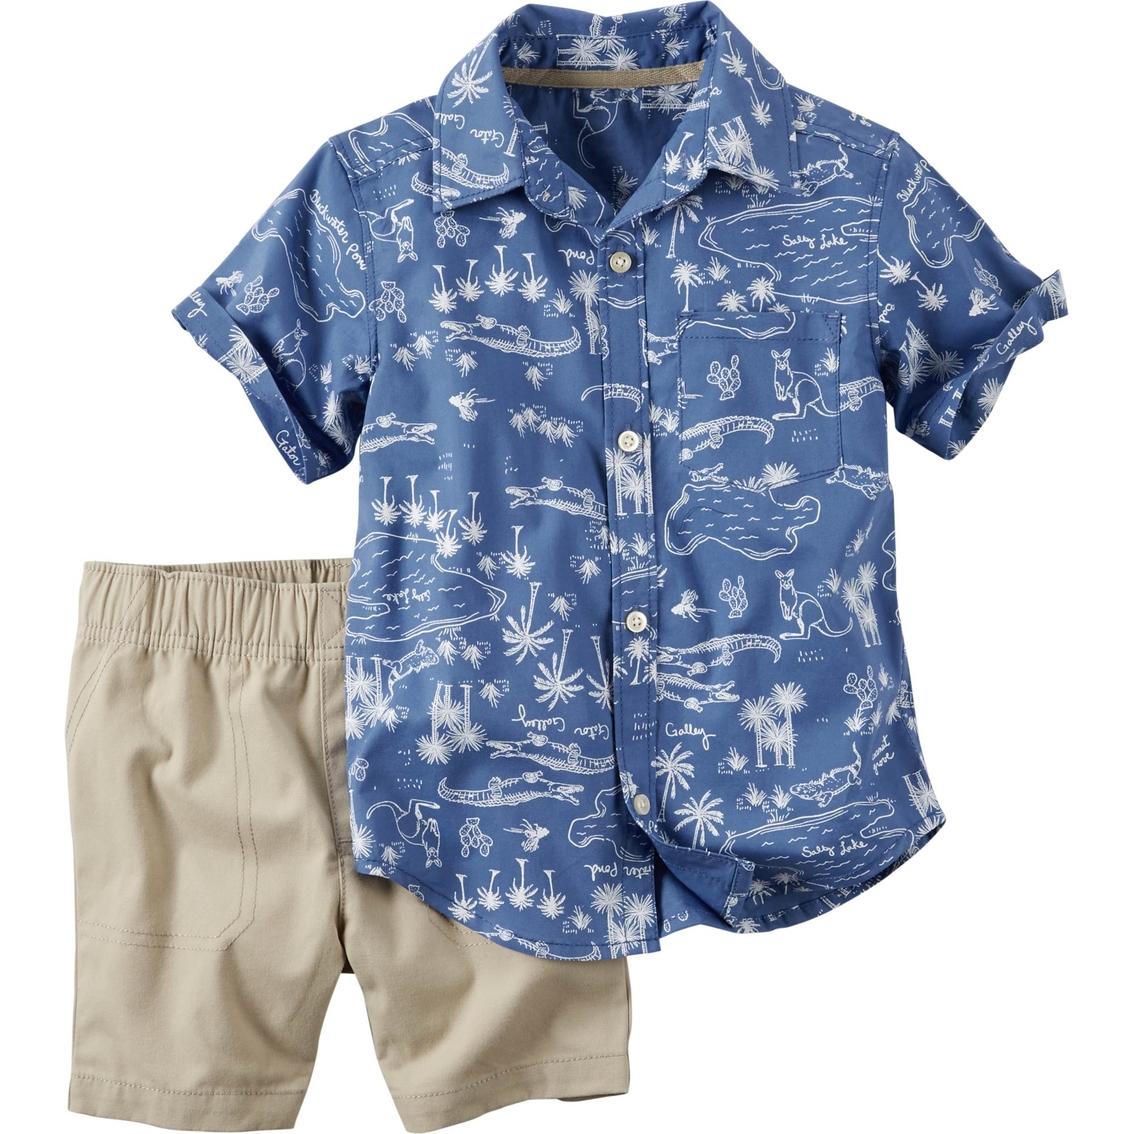 Carters Toddler Boys Blue Button Down Shirt Khaki Shorts 2 Pc Set